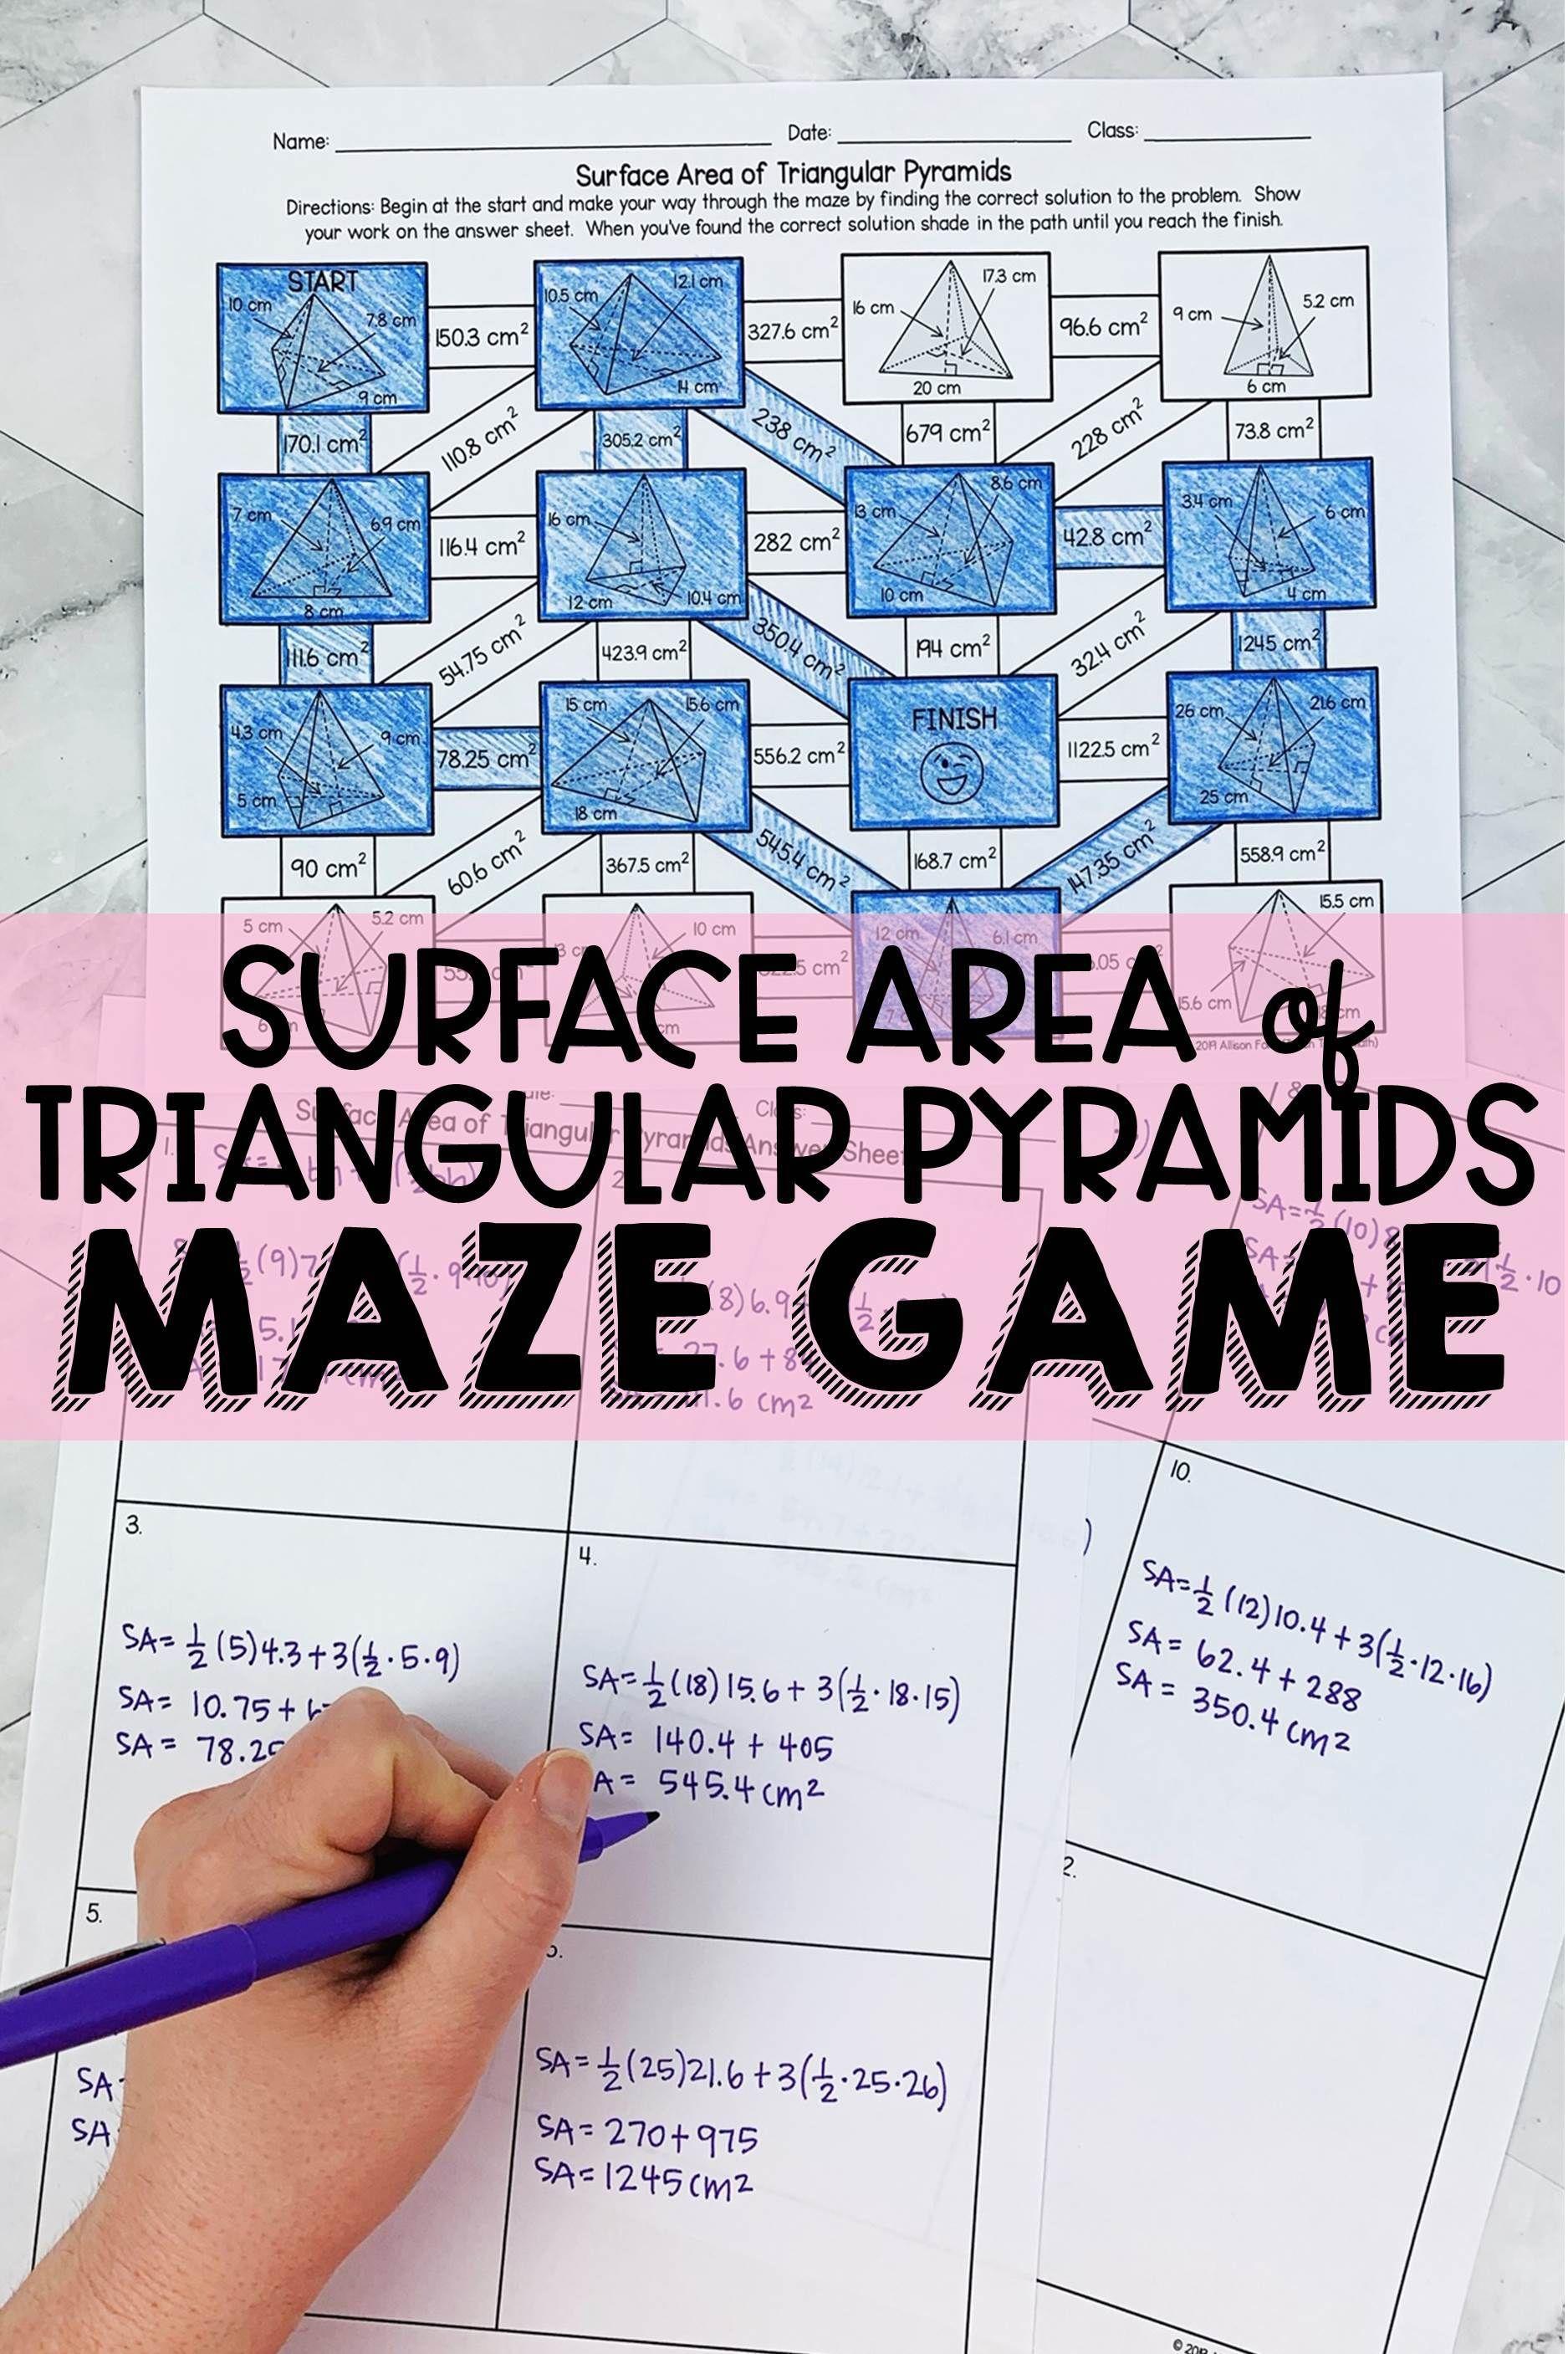 Surface Area Of Triangular Pyramids Maze